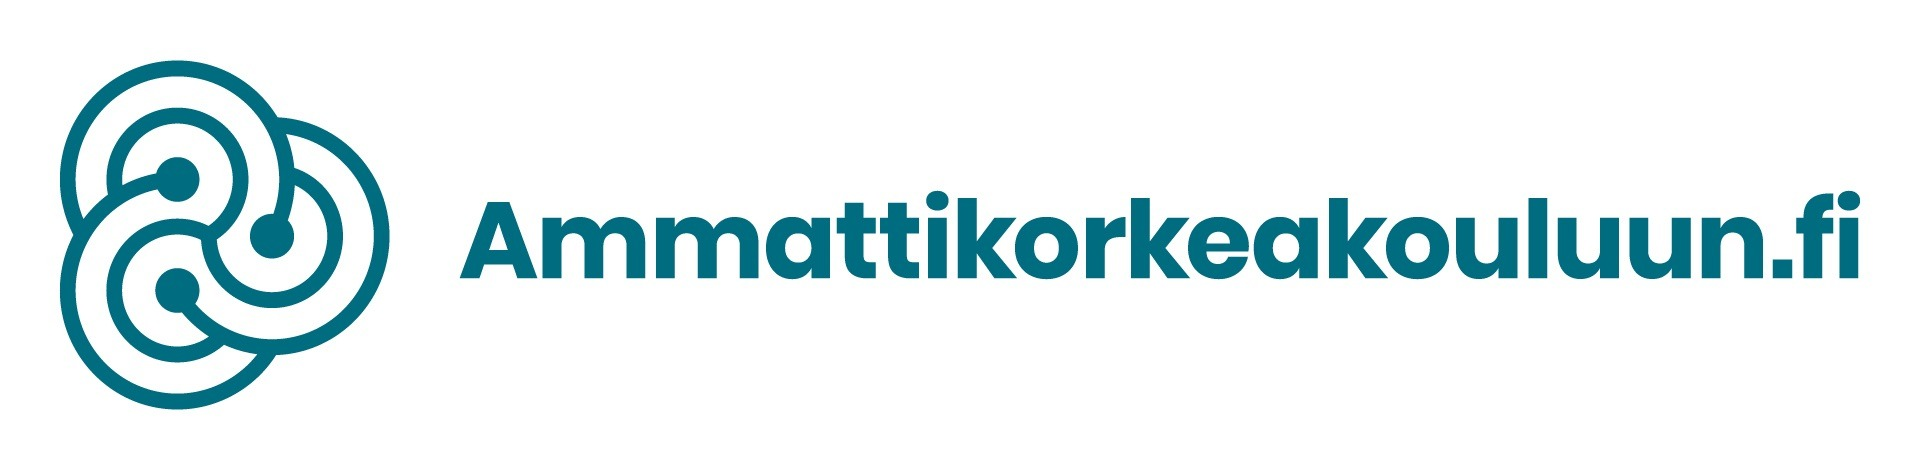 Ammattikorkeakouluun.fi -logo